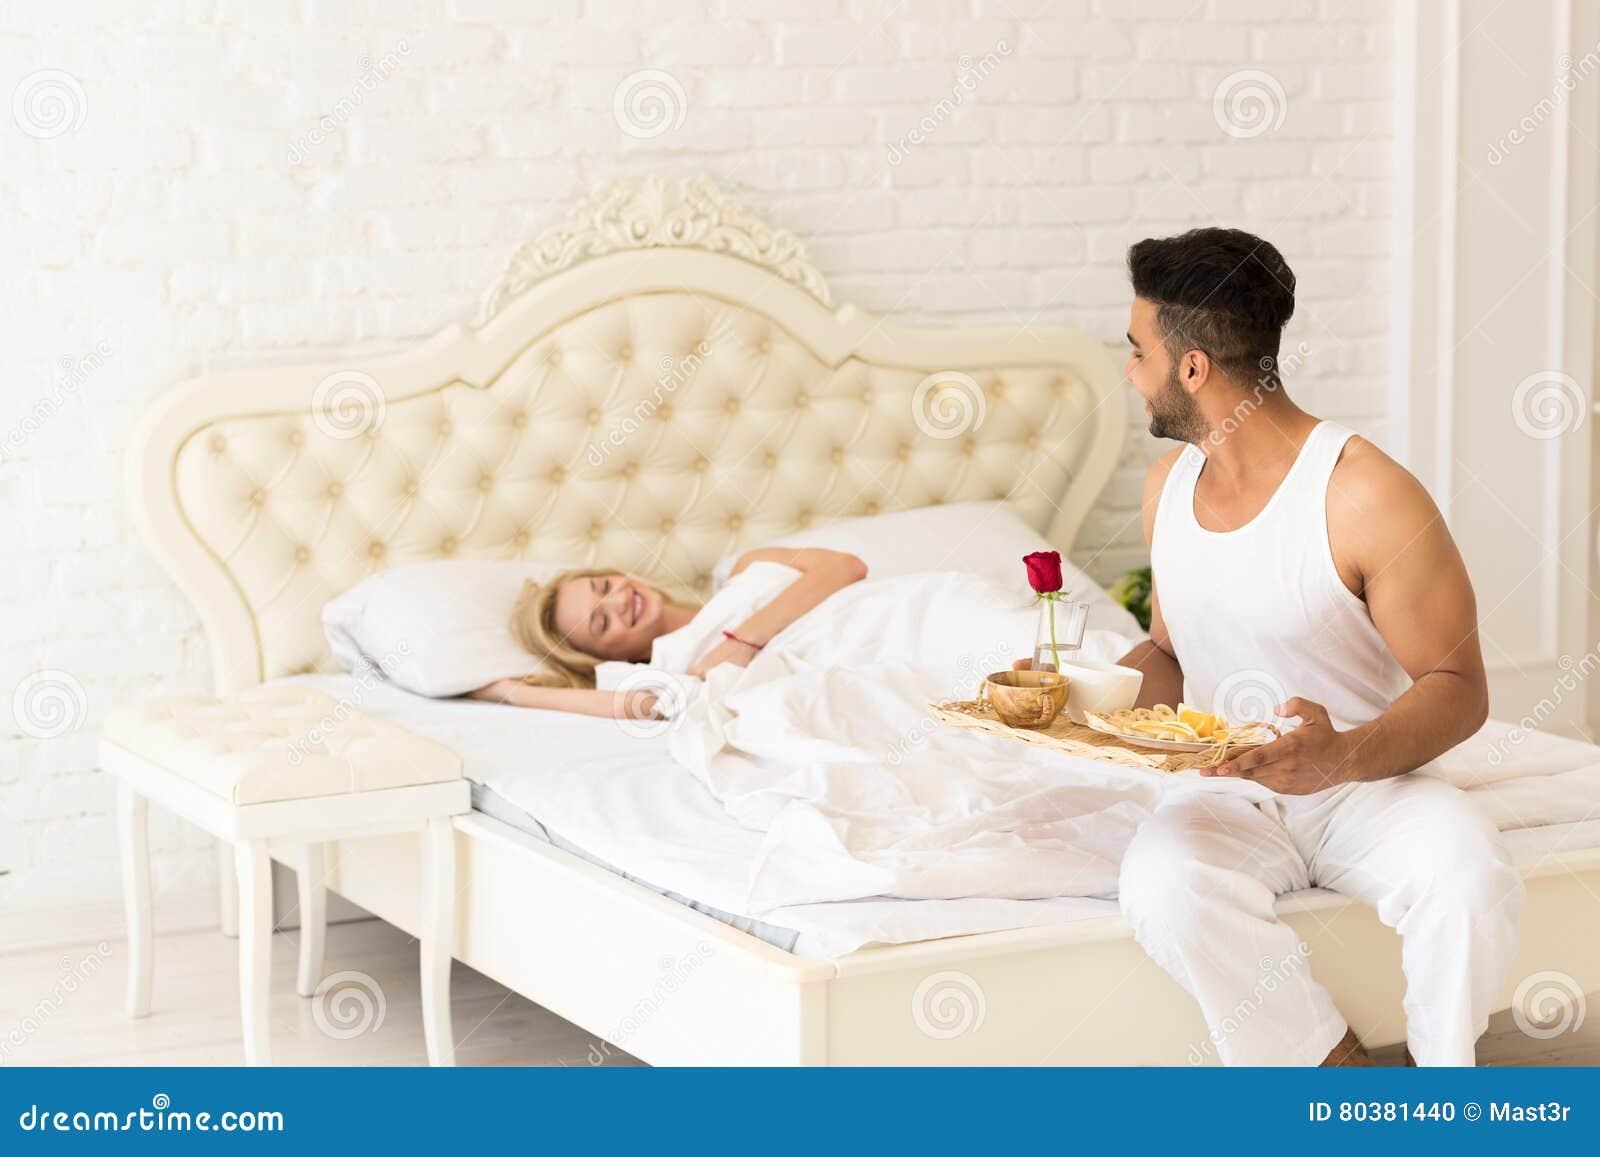 Happy Happy Joy Joy Bed And Breakfast